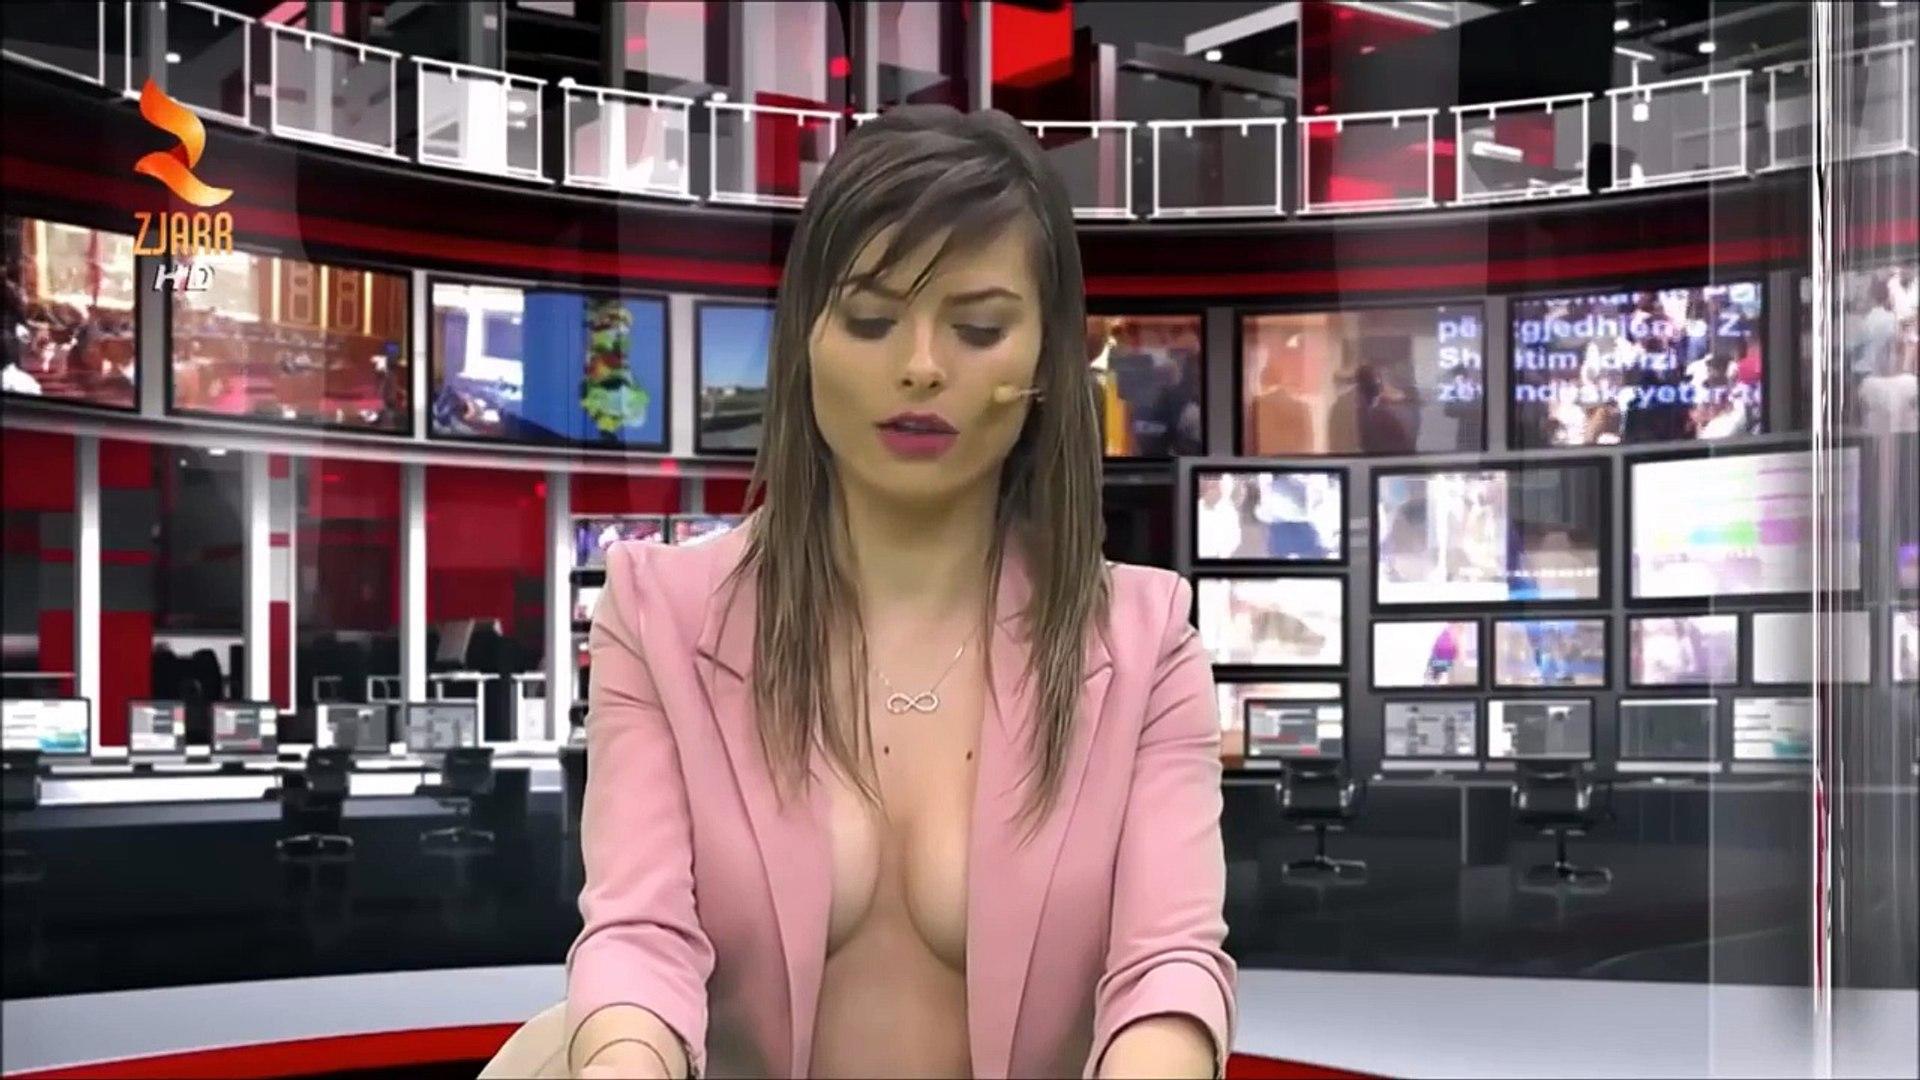 Fran Meric Desnuda greta sexy albanian tv news 21/01/2016 topless and pink vest deep cleavage